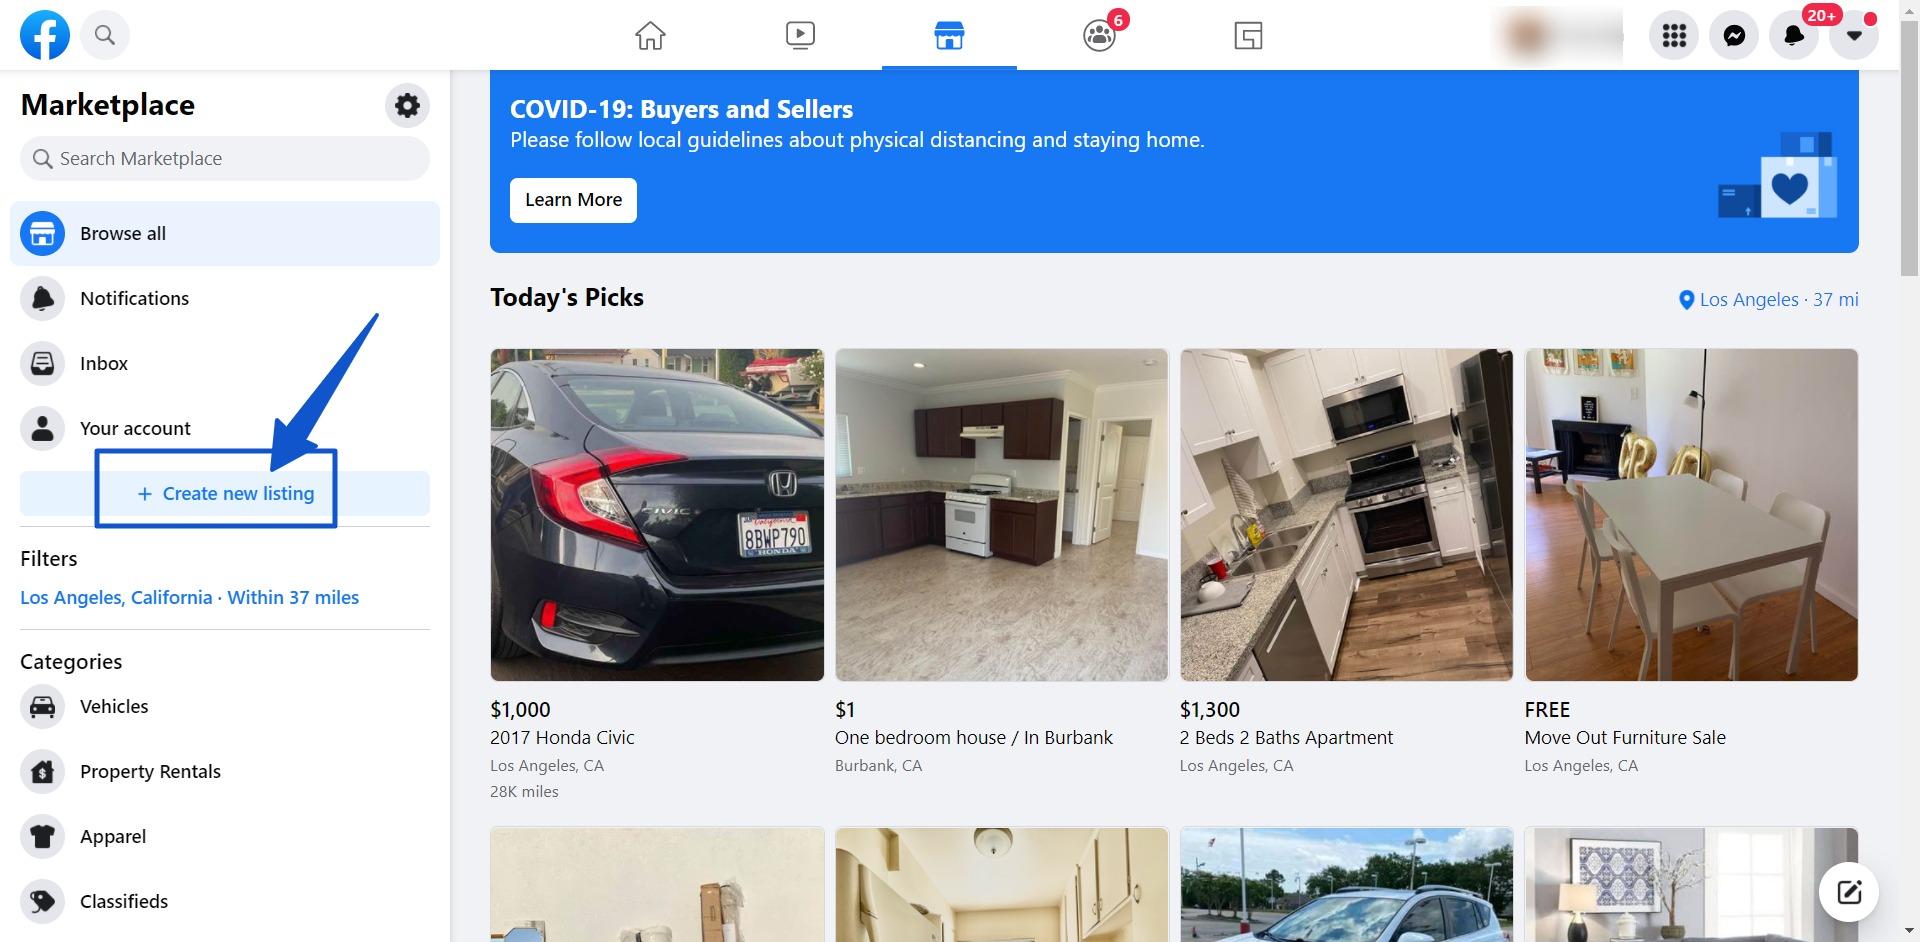 Create new listing